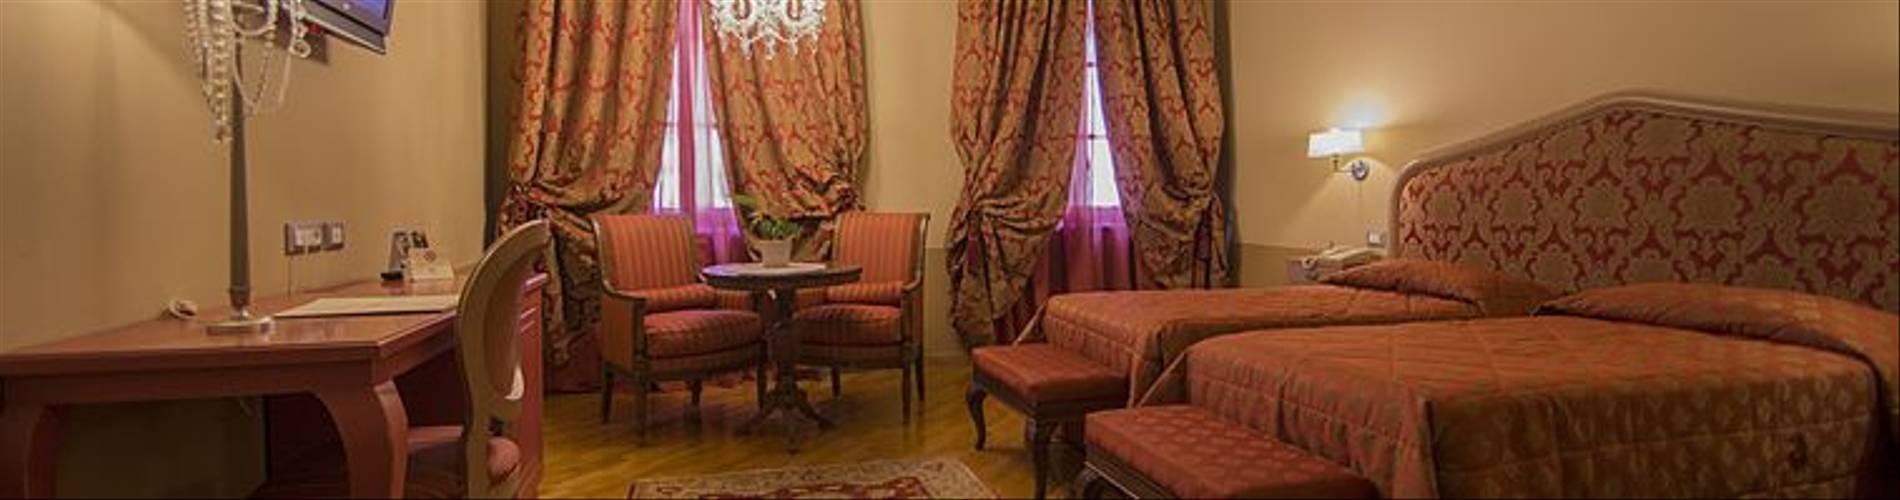 11-Hotel San Luca Palace.jpeg